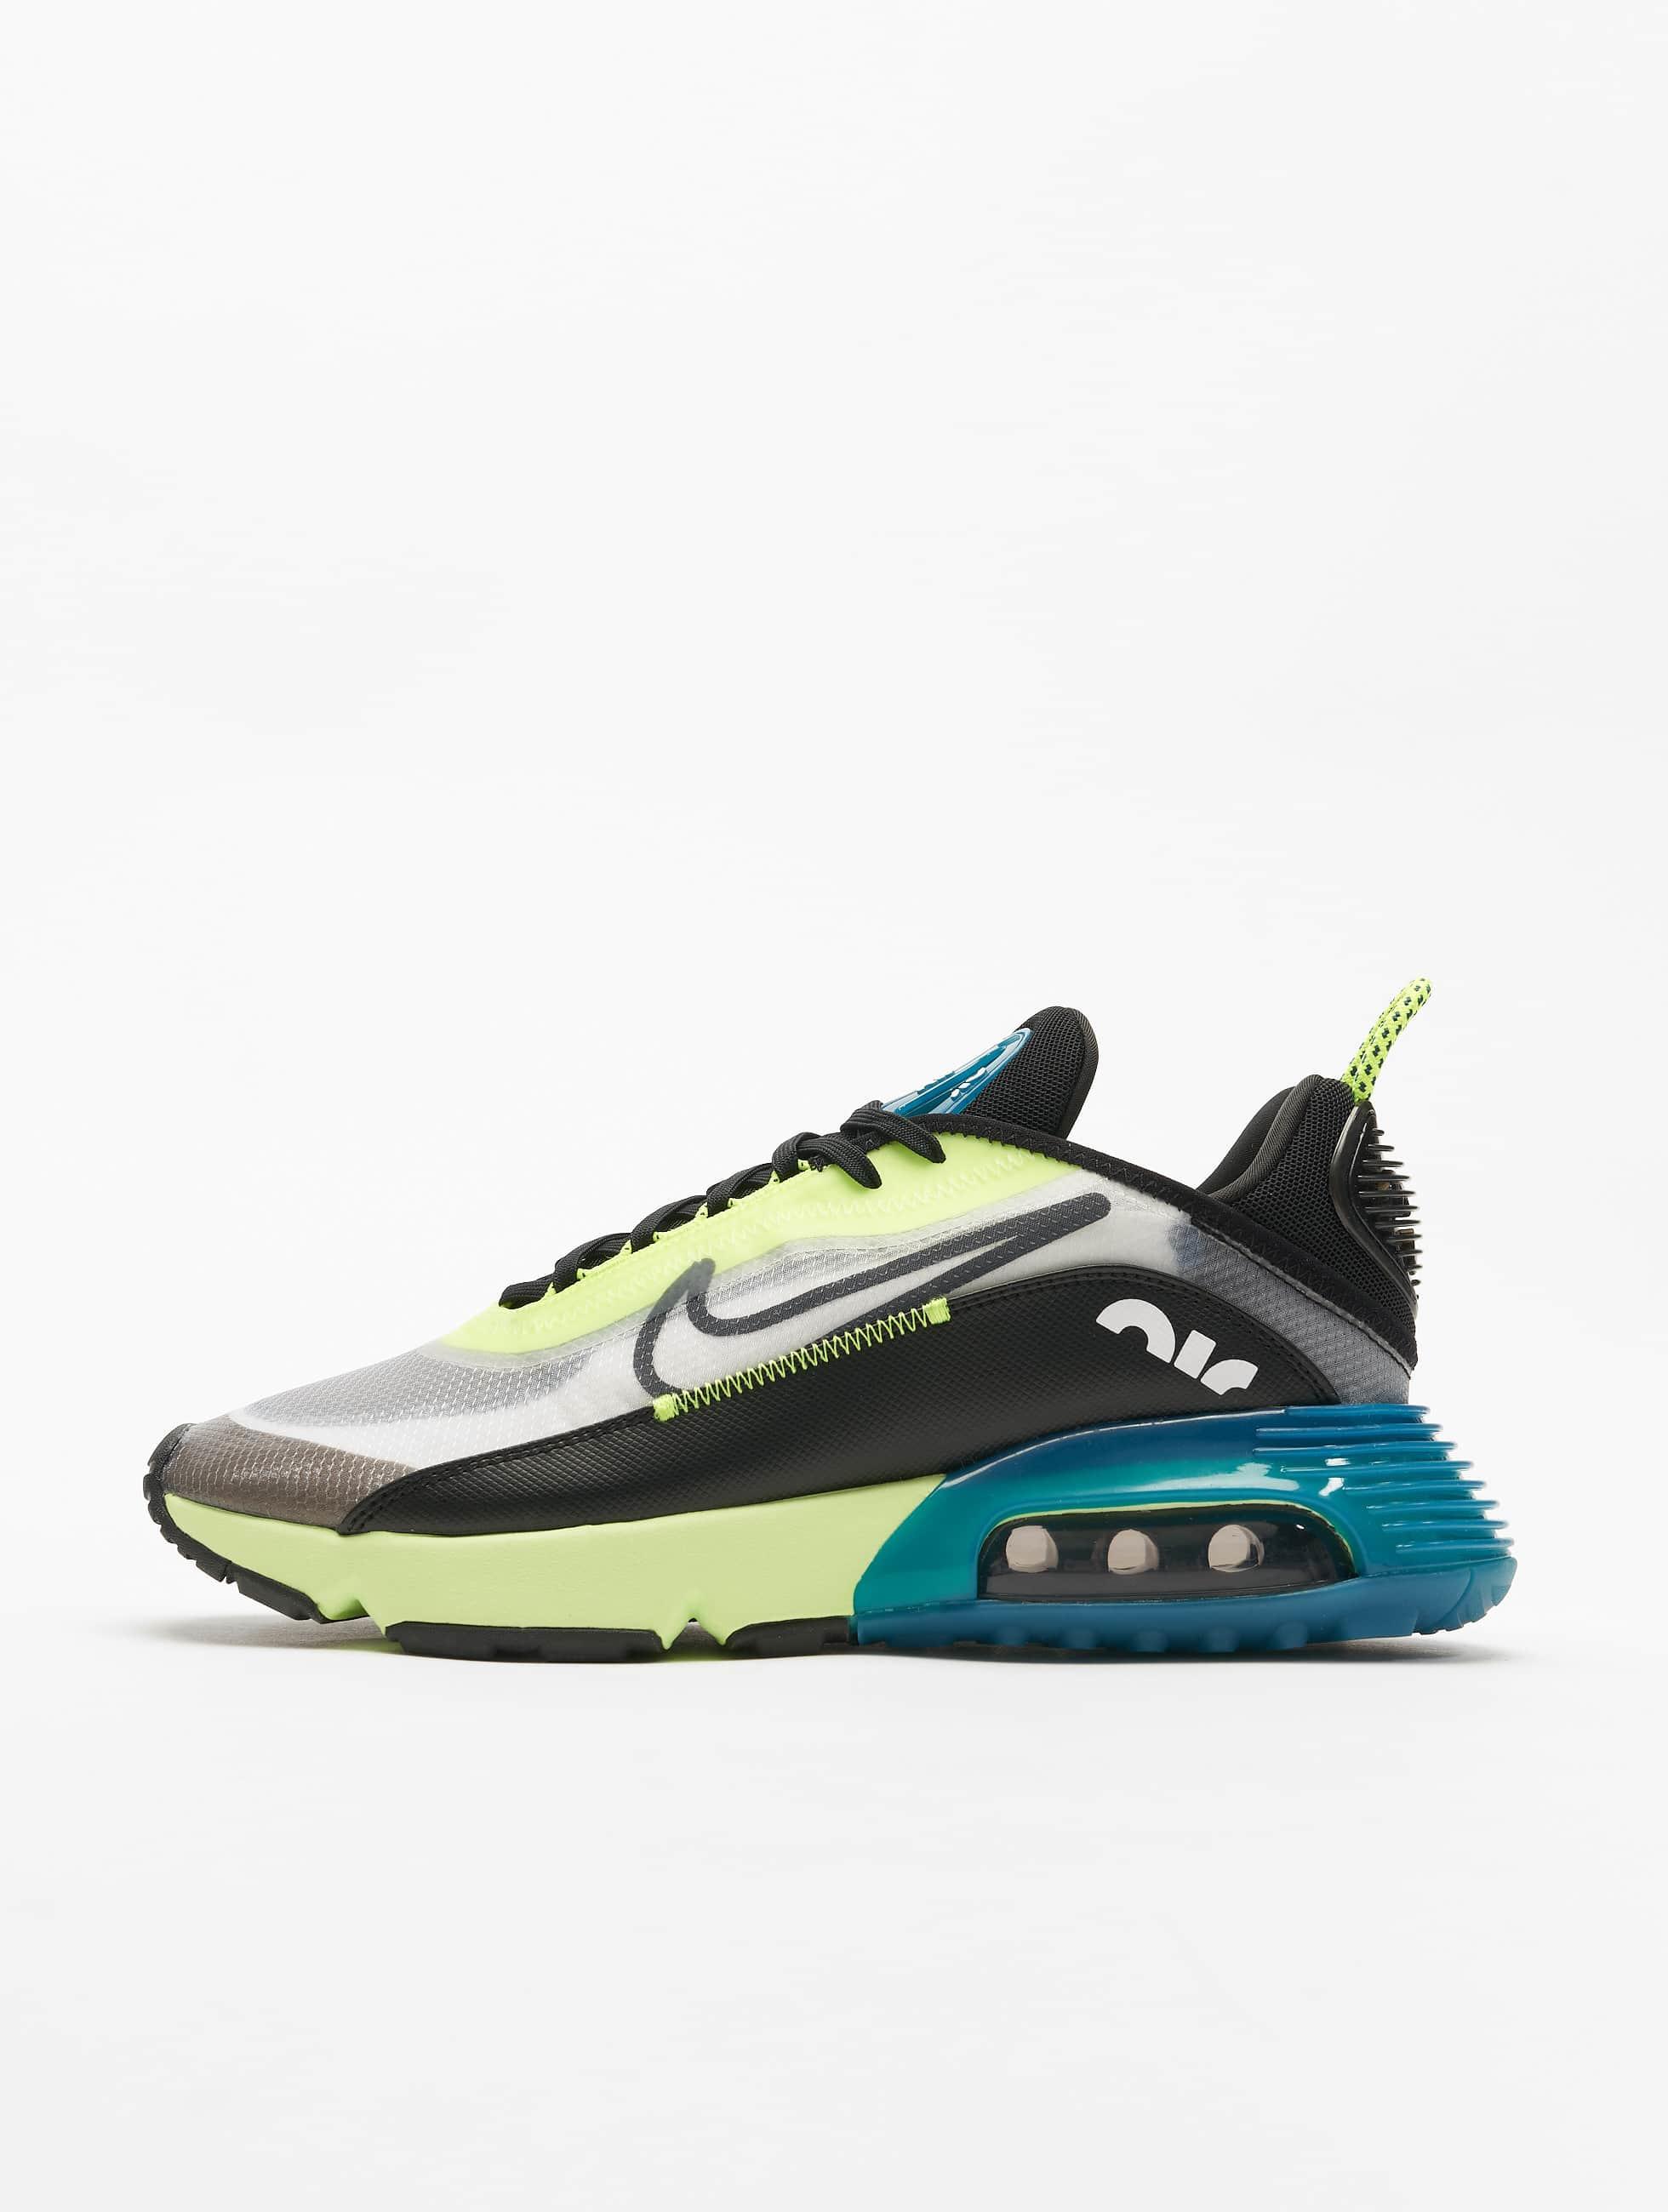 Nike Air Max 2090 Sneakers WhiteBlackVoltValerian Blue